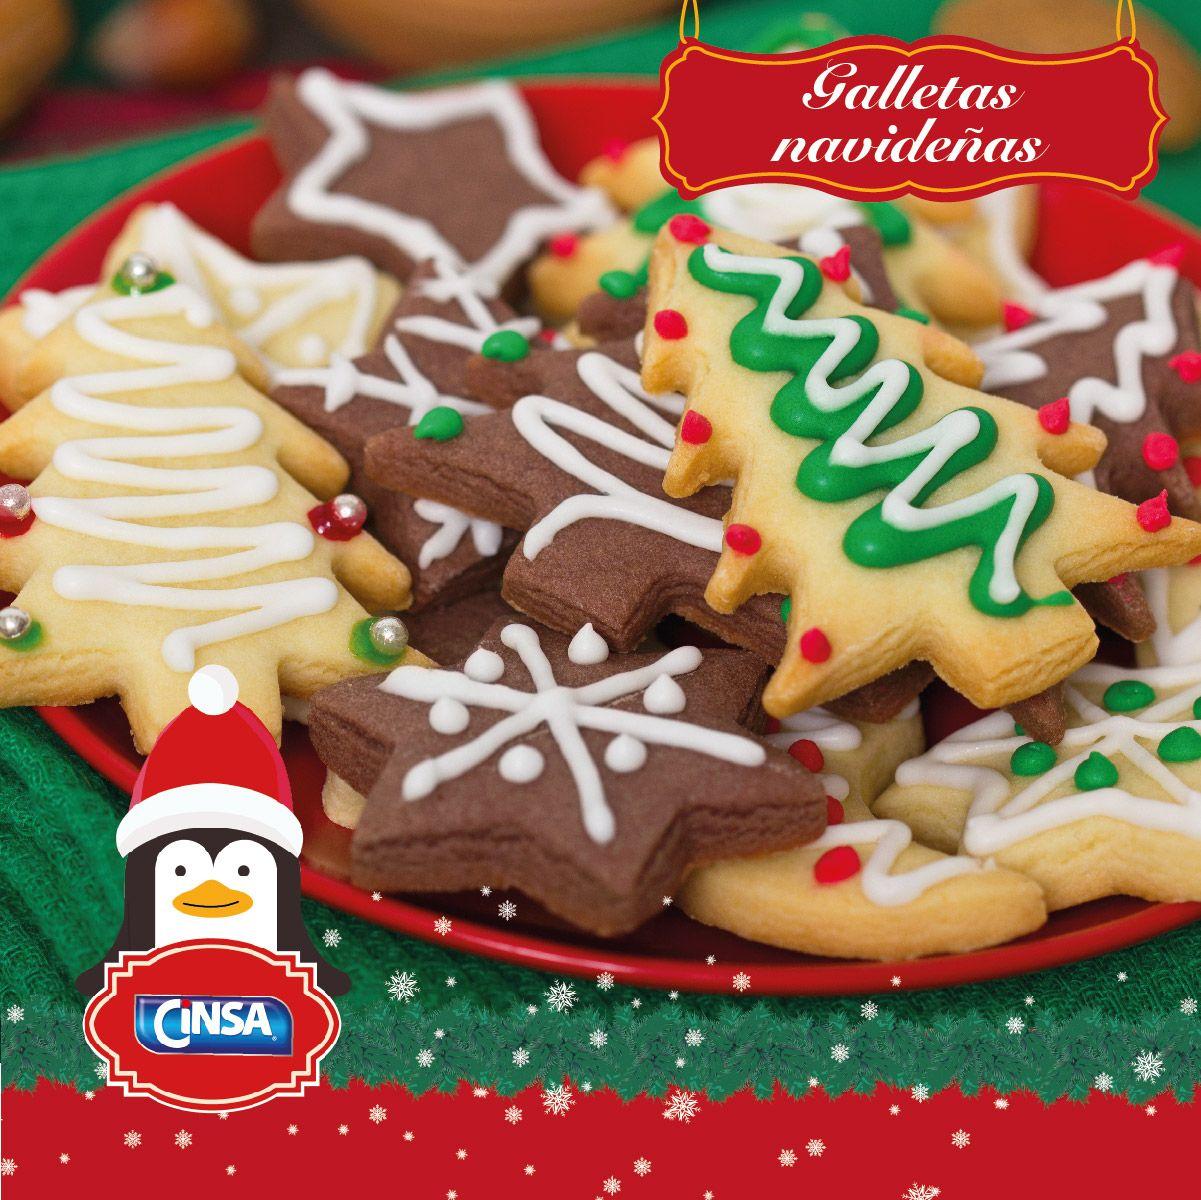 Cinsa Recetas Navidad Galletasnavideñas Recetasnavideñas Marcasmexicanas Galletas De Navidad Para Niños Recetas De Galletas De Navidad Dulces Navideños